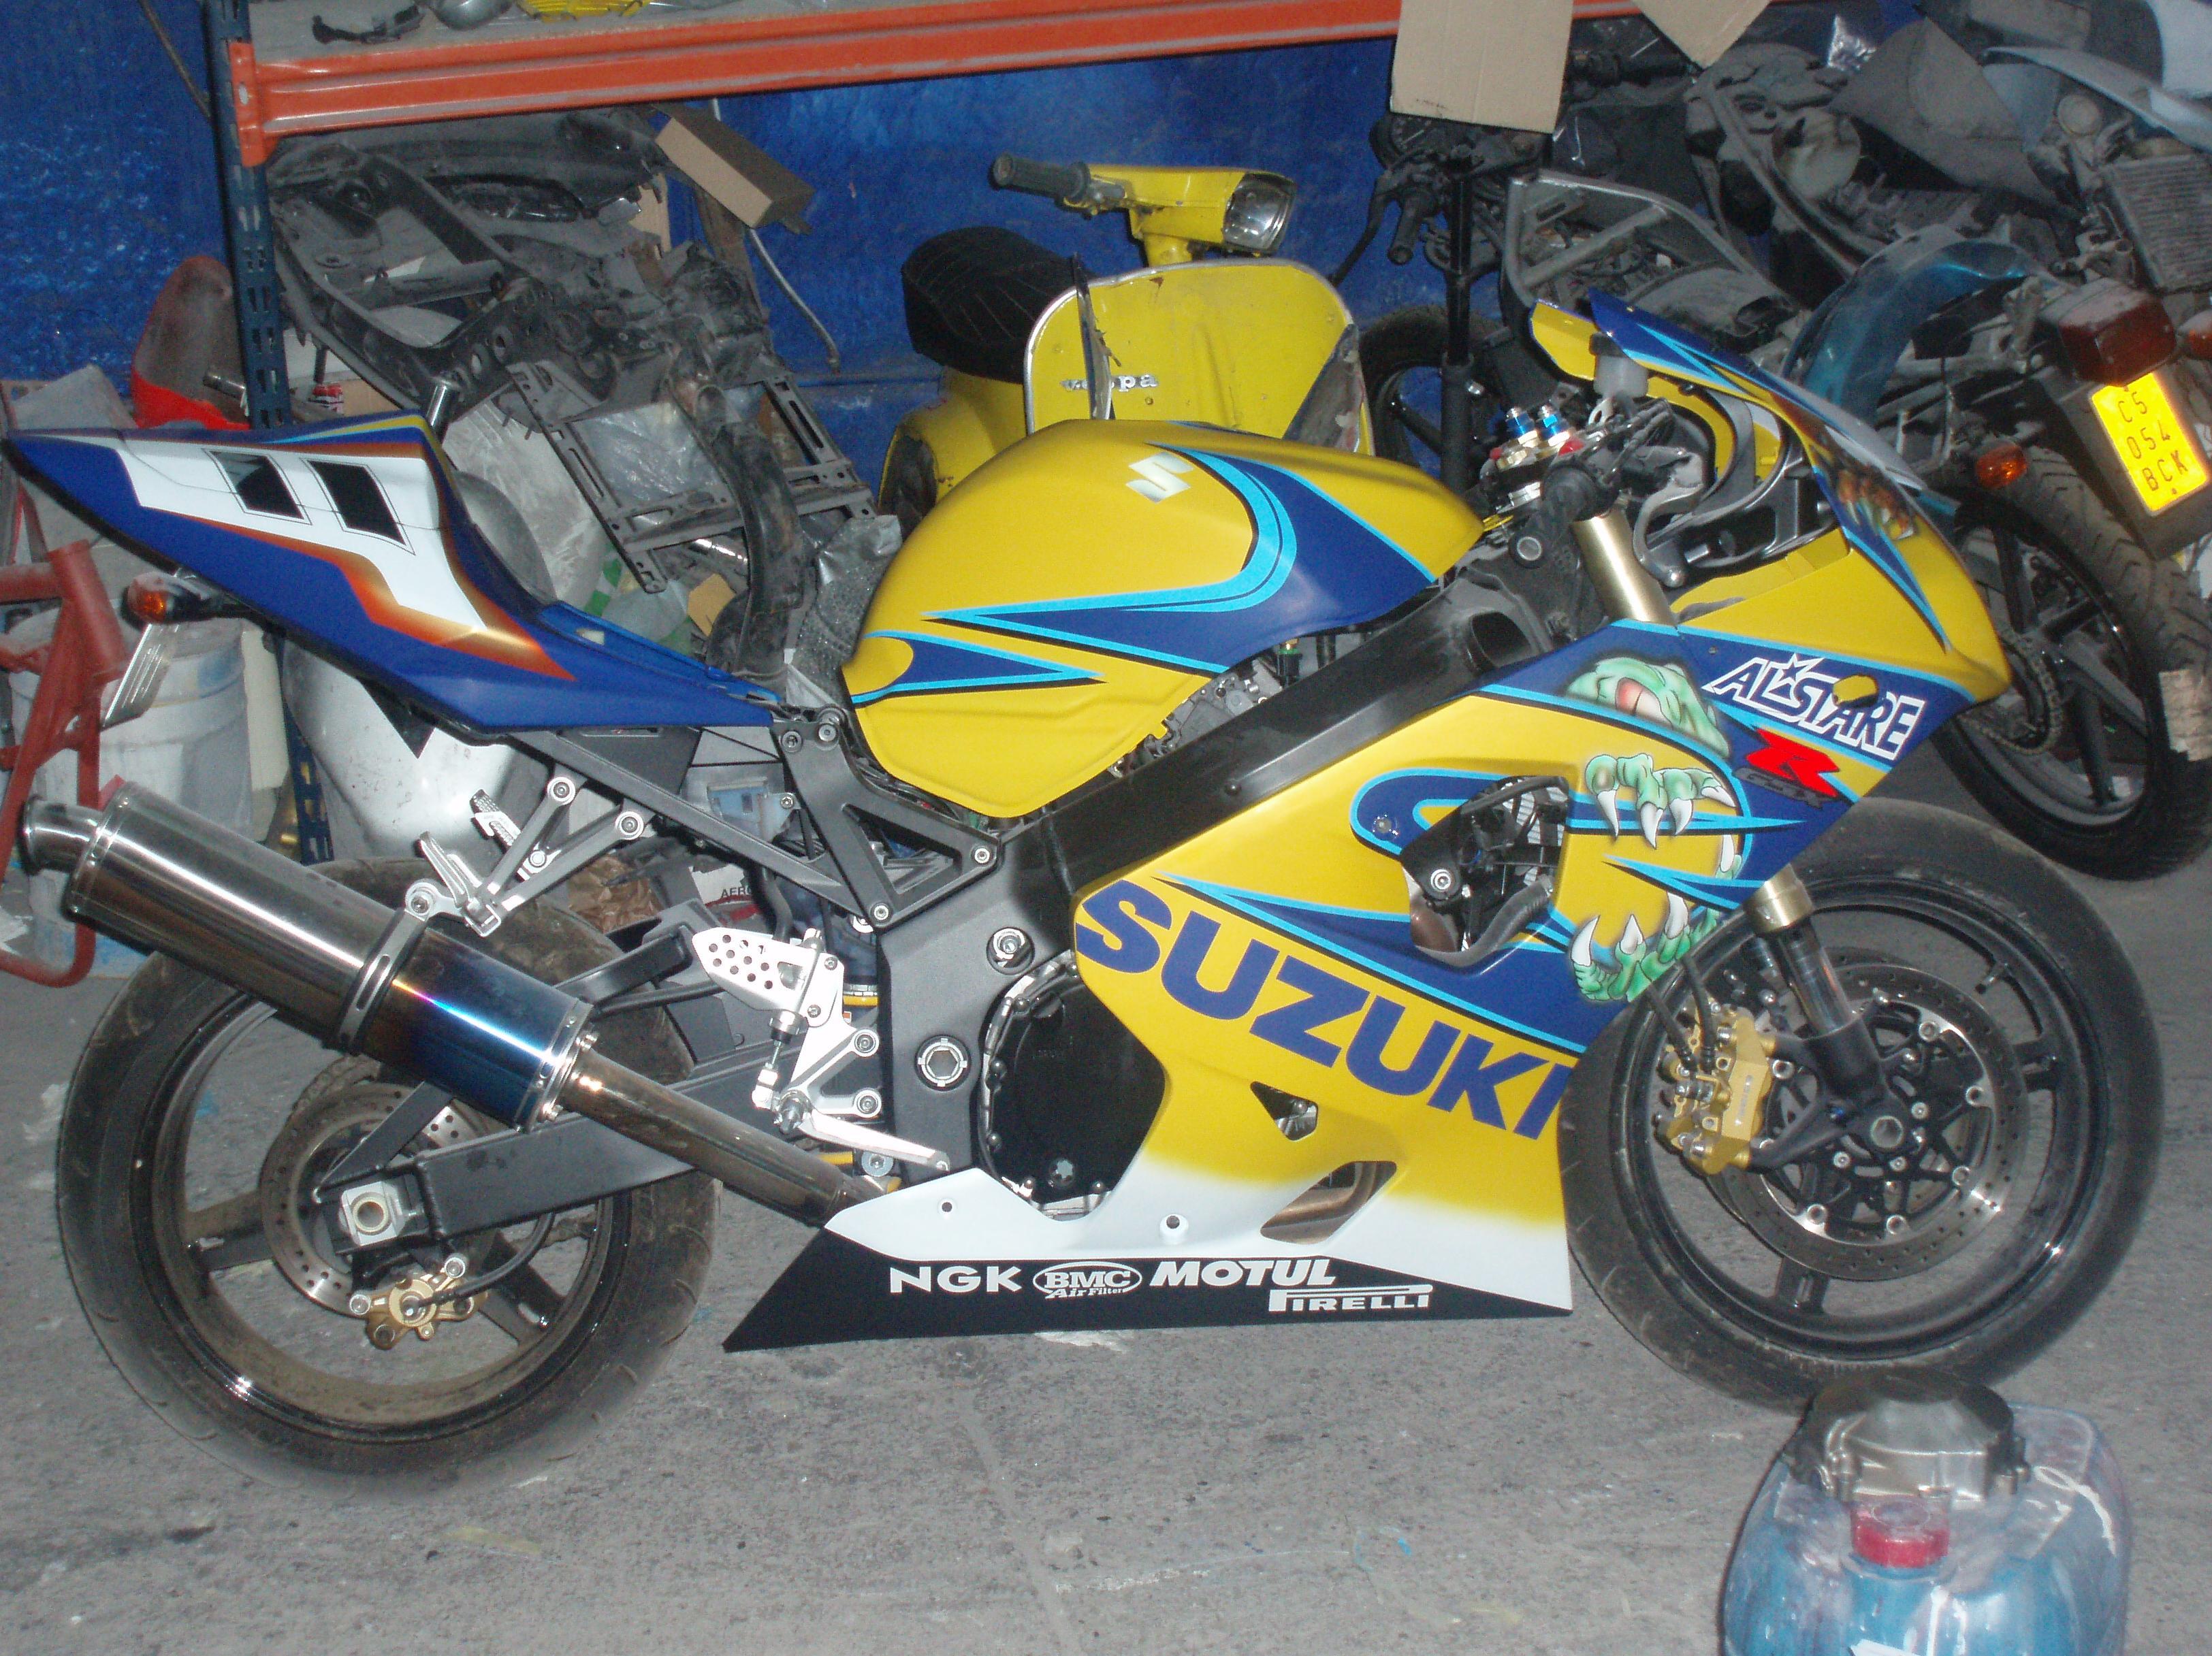 Foto 4 de Motos en Vigo | Moto 2